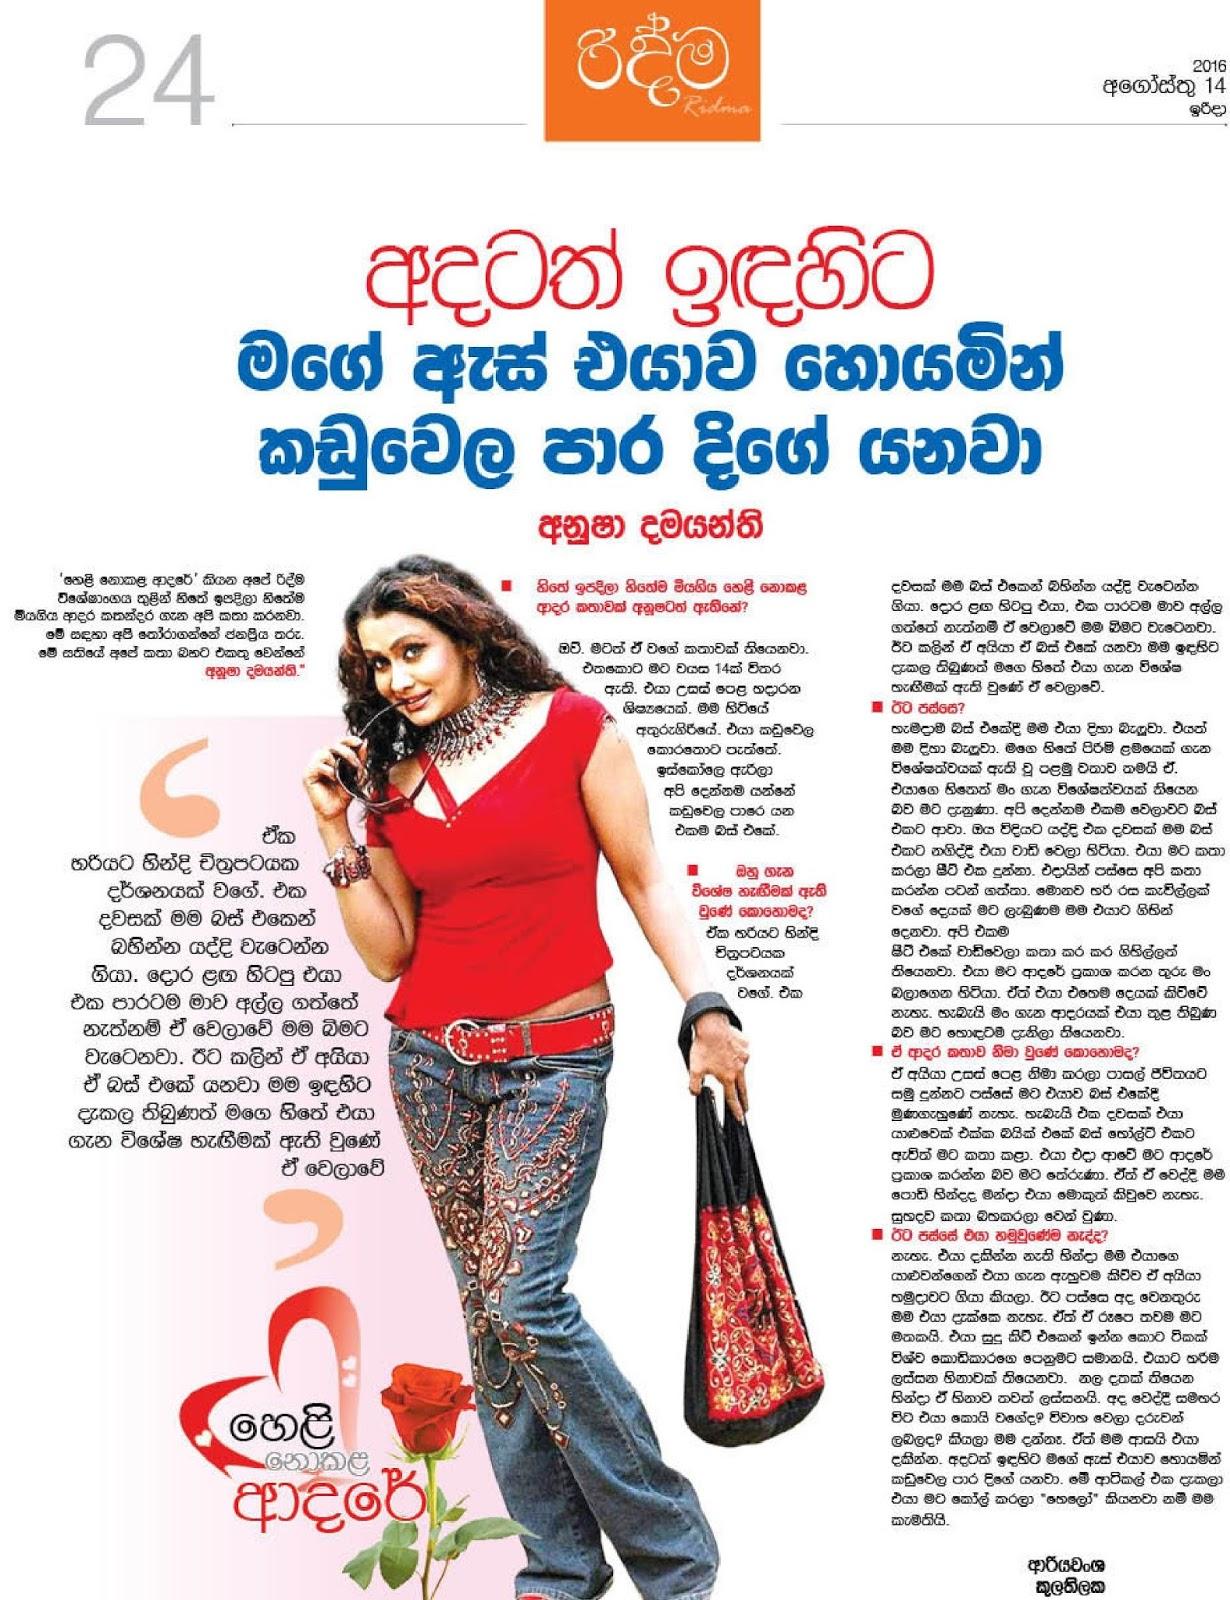 Gossip Chat with Anusha Damayanthi | Gossip Lanka News